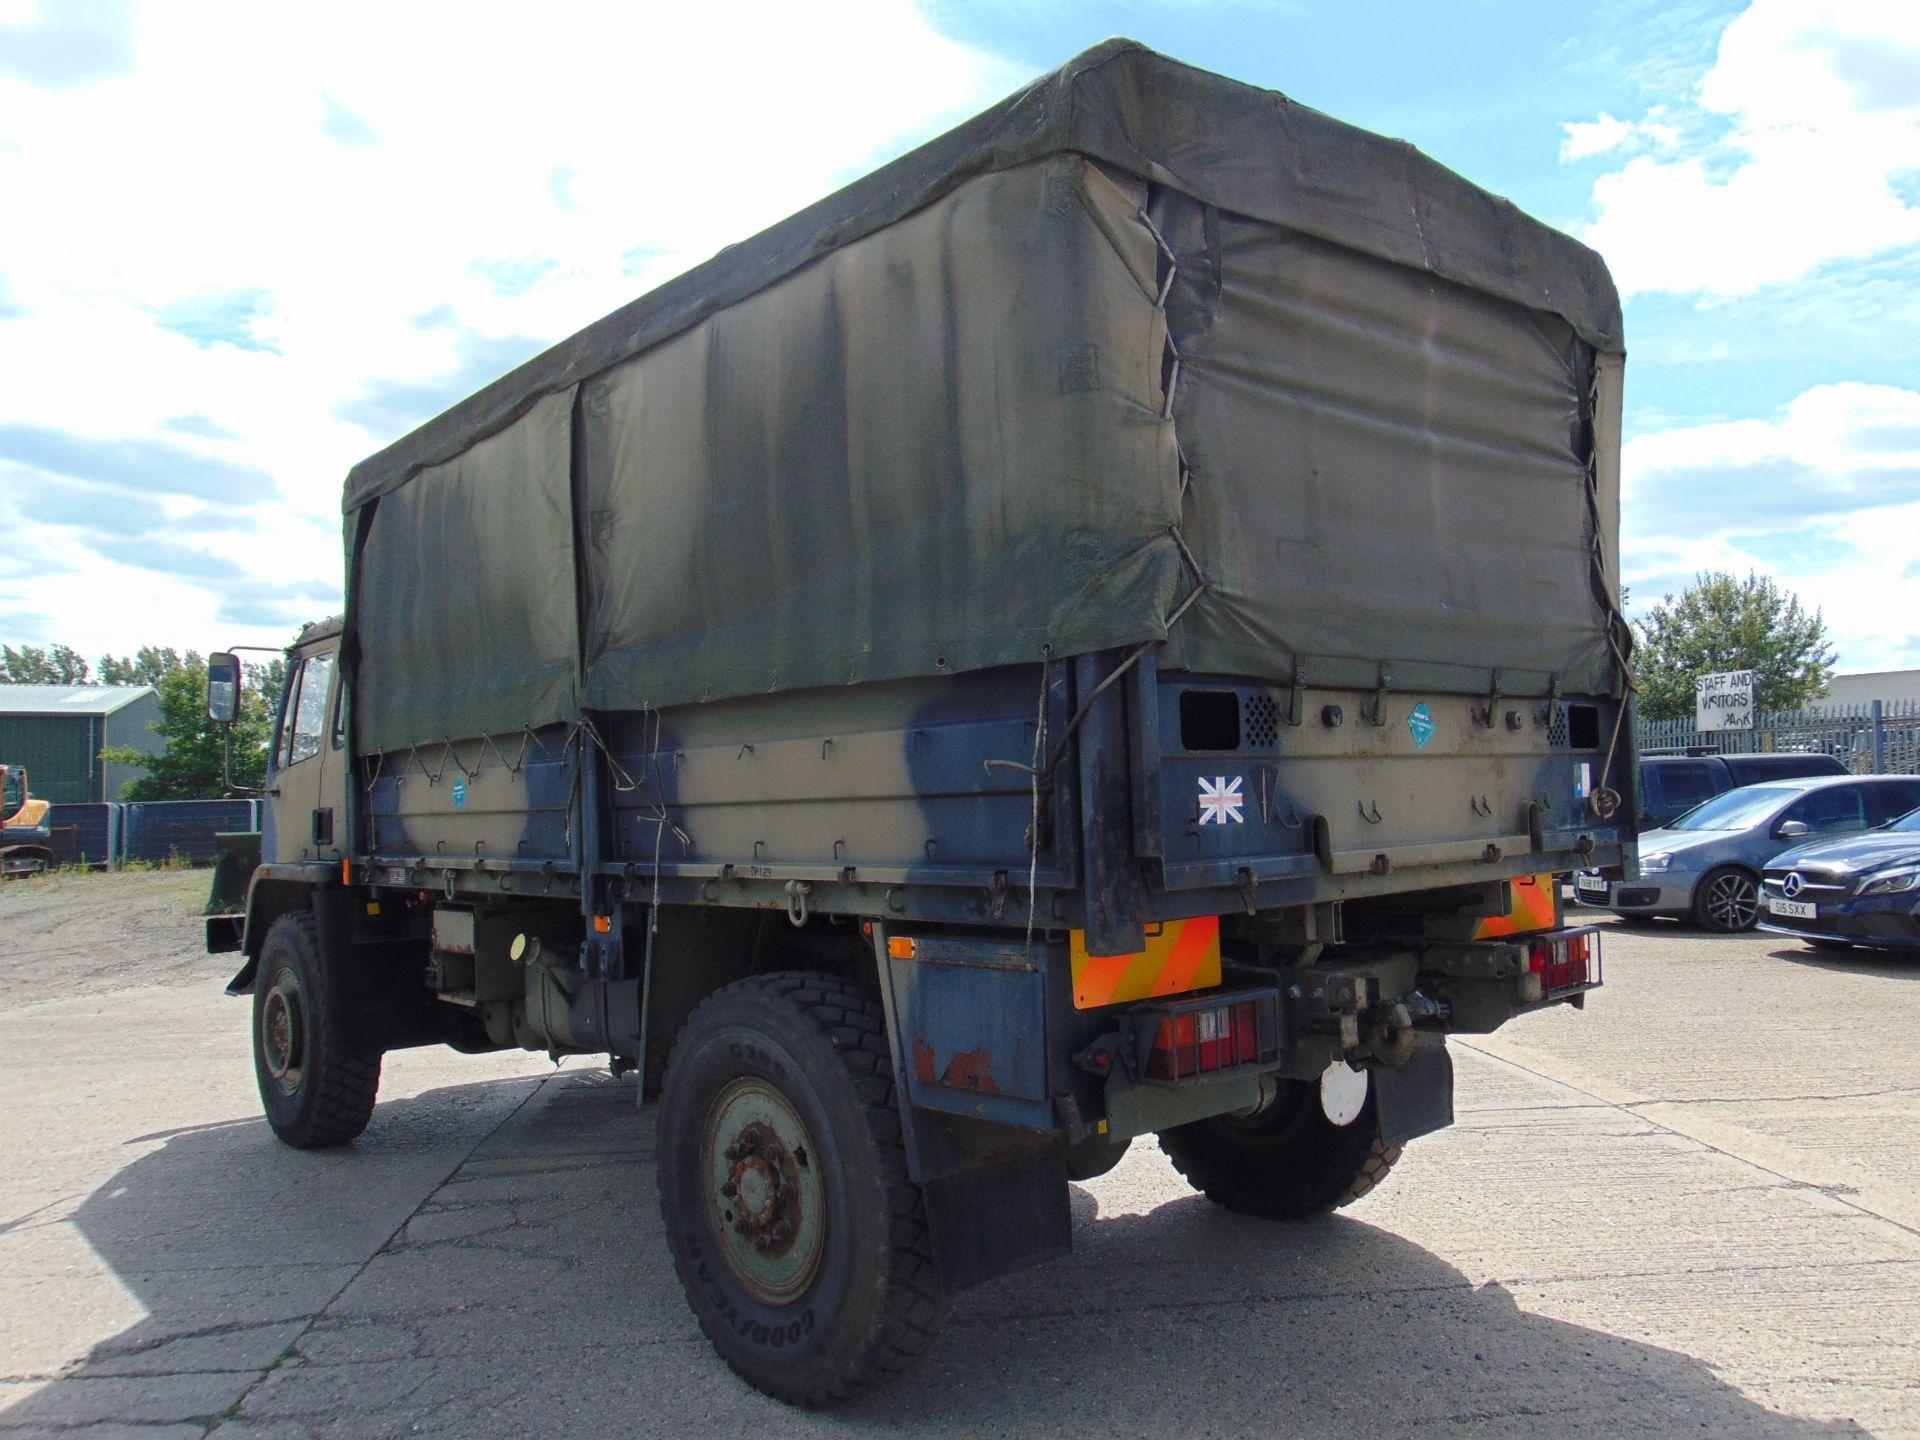 Leyland Daf 45/150 4 x 4 - Image 8 of 22